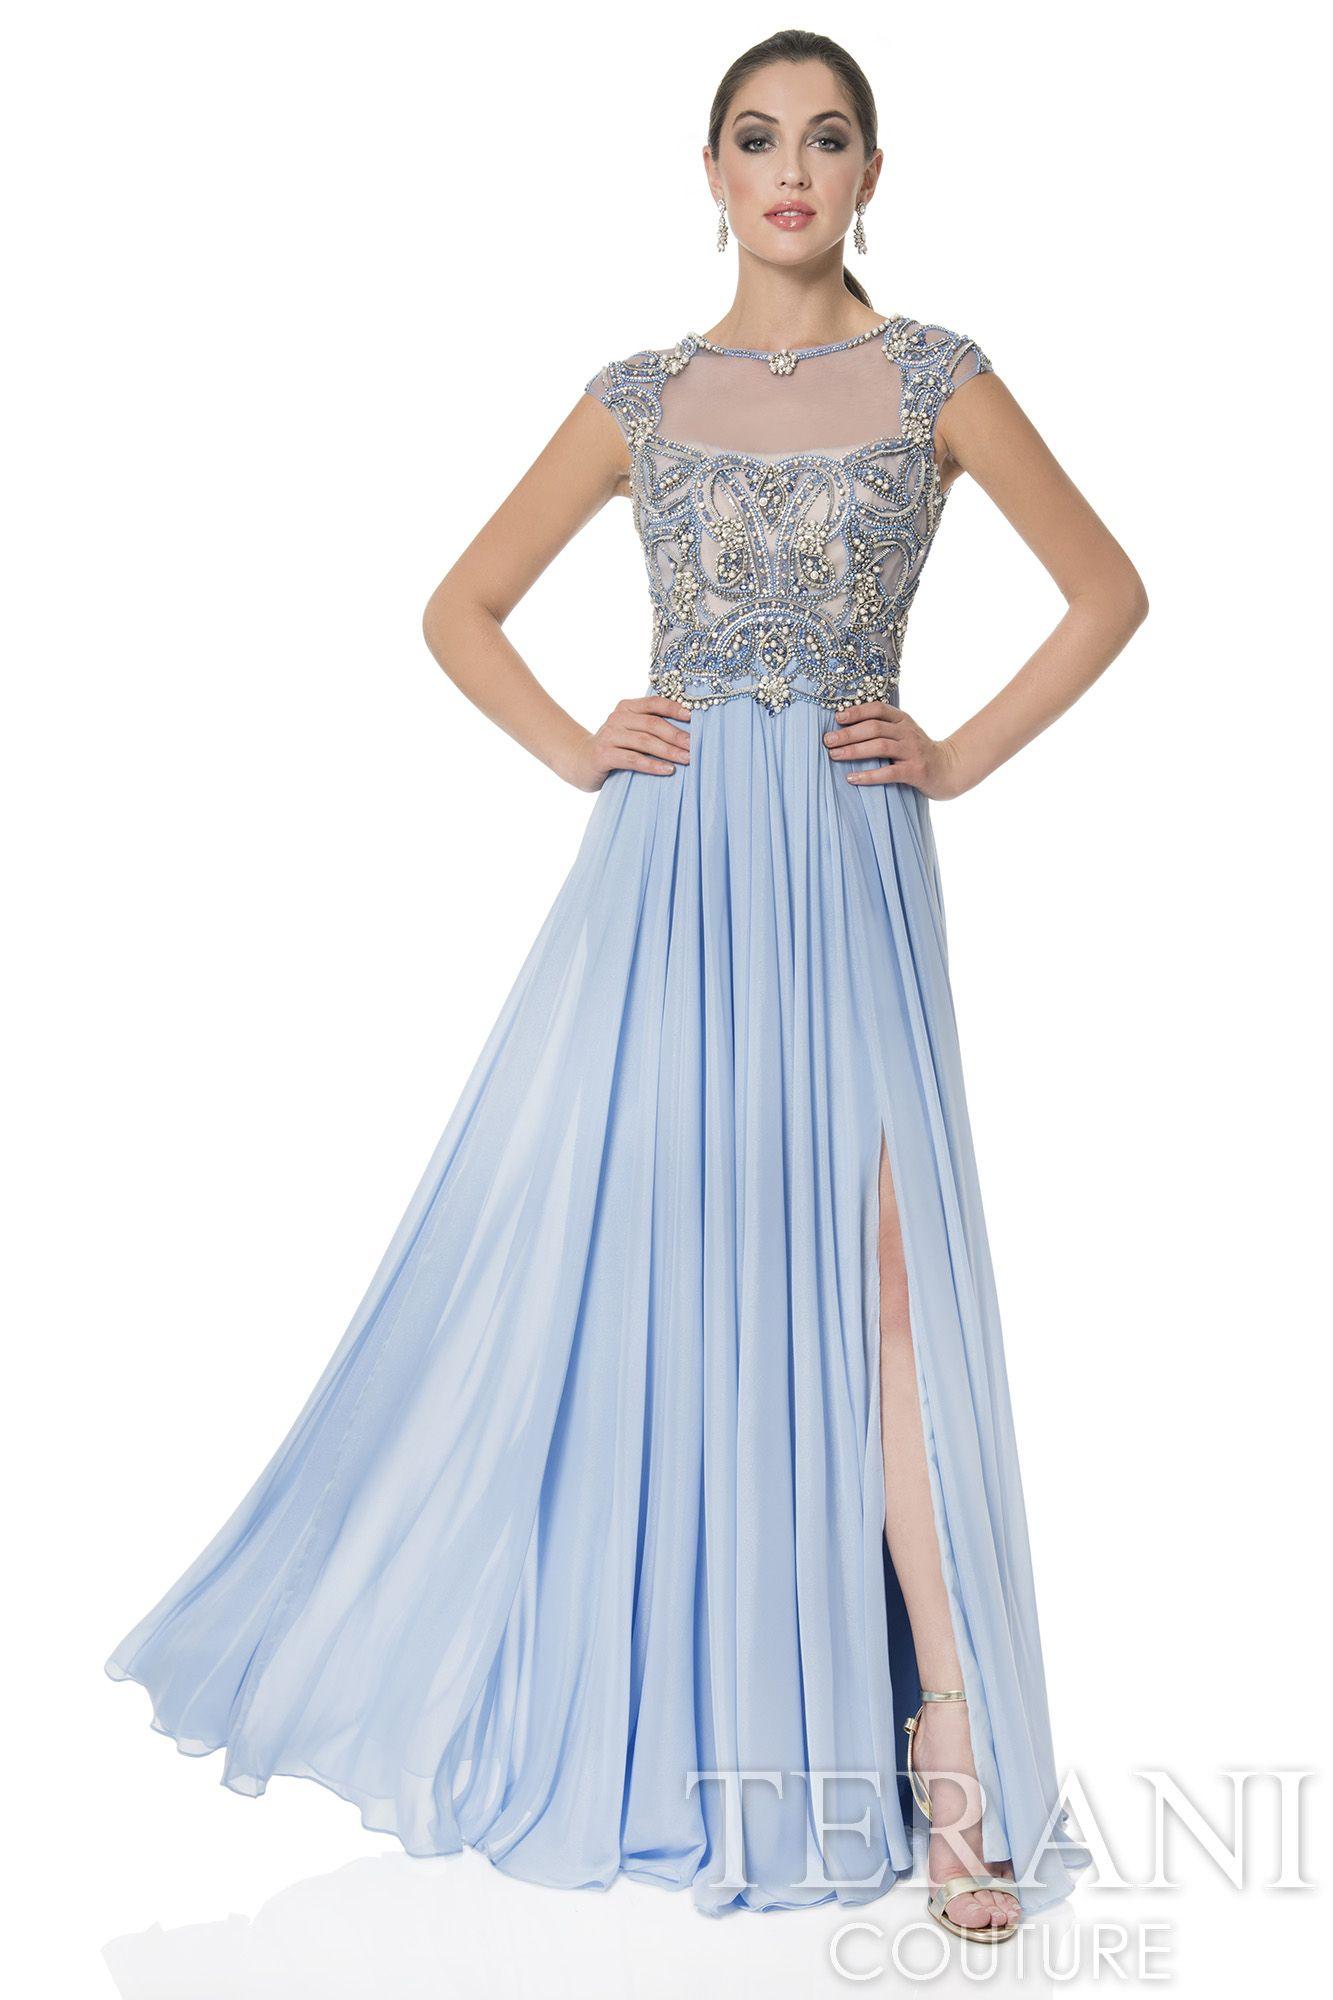 Terani Couture MoB Dresses 1613M0712 - USA Prom Dress http://bit ...